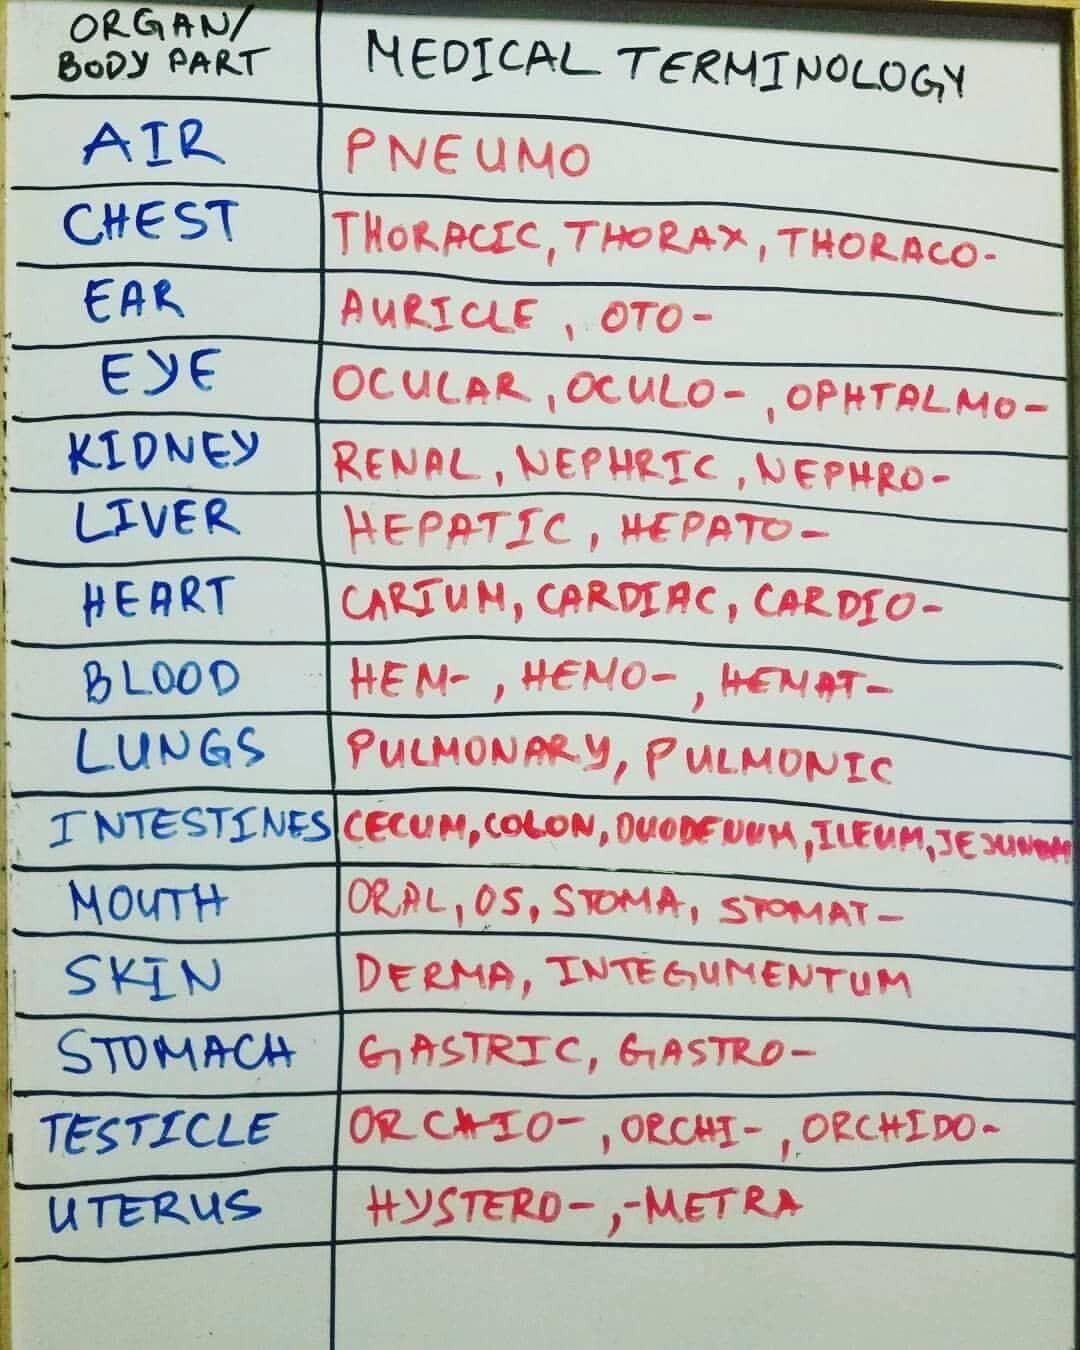 Organ And Its Medical Terminology Used Followforupdates